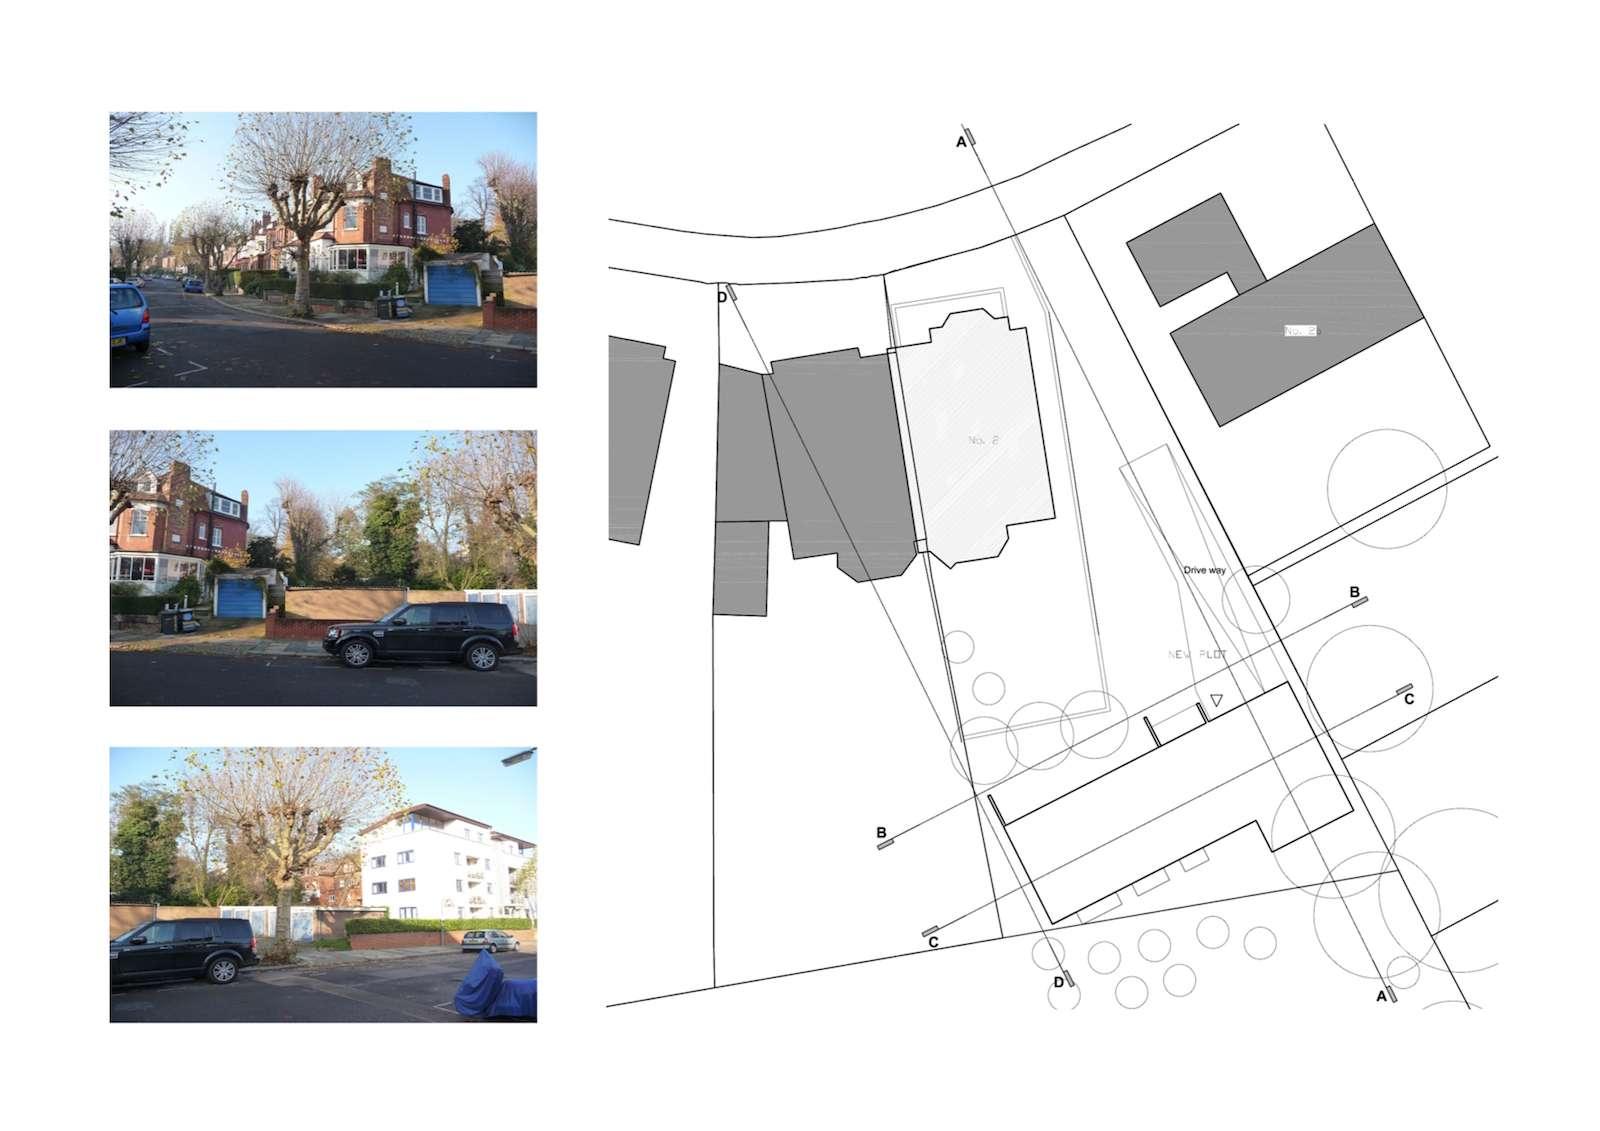 01 Highgate Haringey N6 House development Site plan Highgate I, Haringey N6 | Residential property development